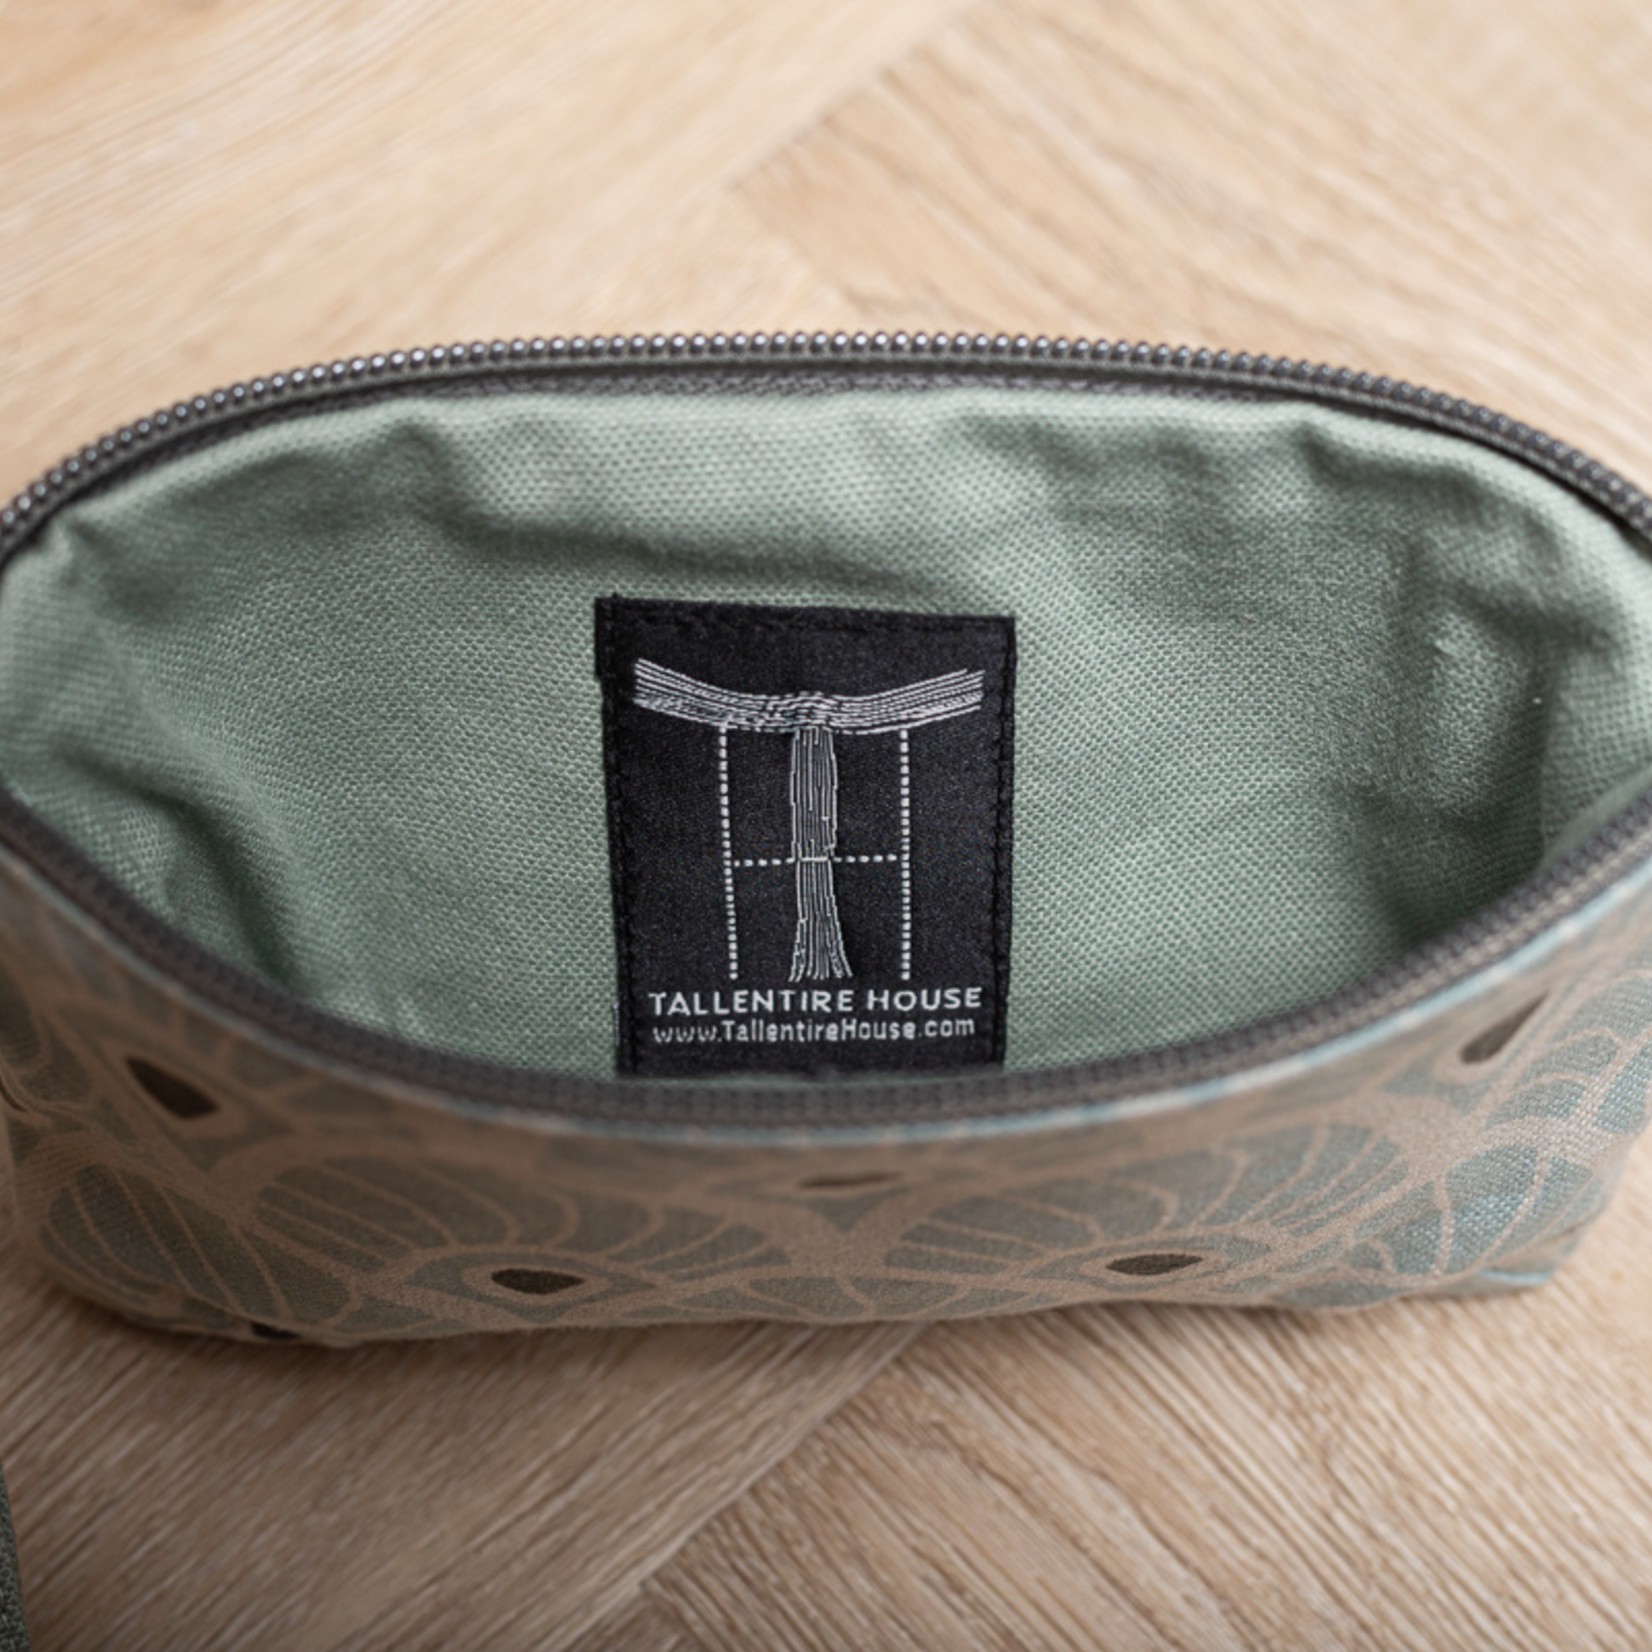 Tallentire House Tallentire House Feather Surfspray sustainable bag